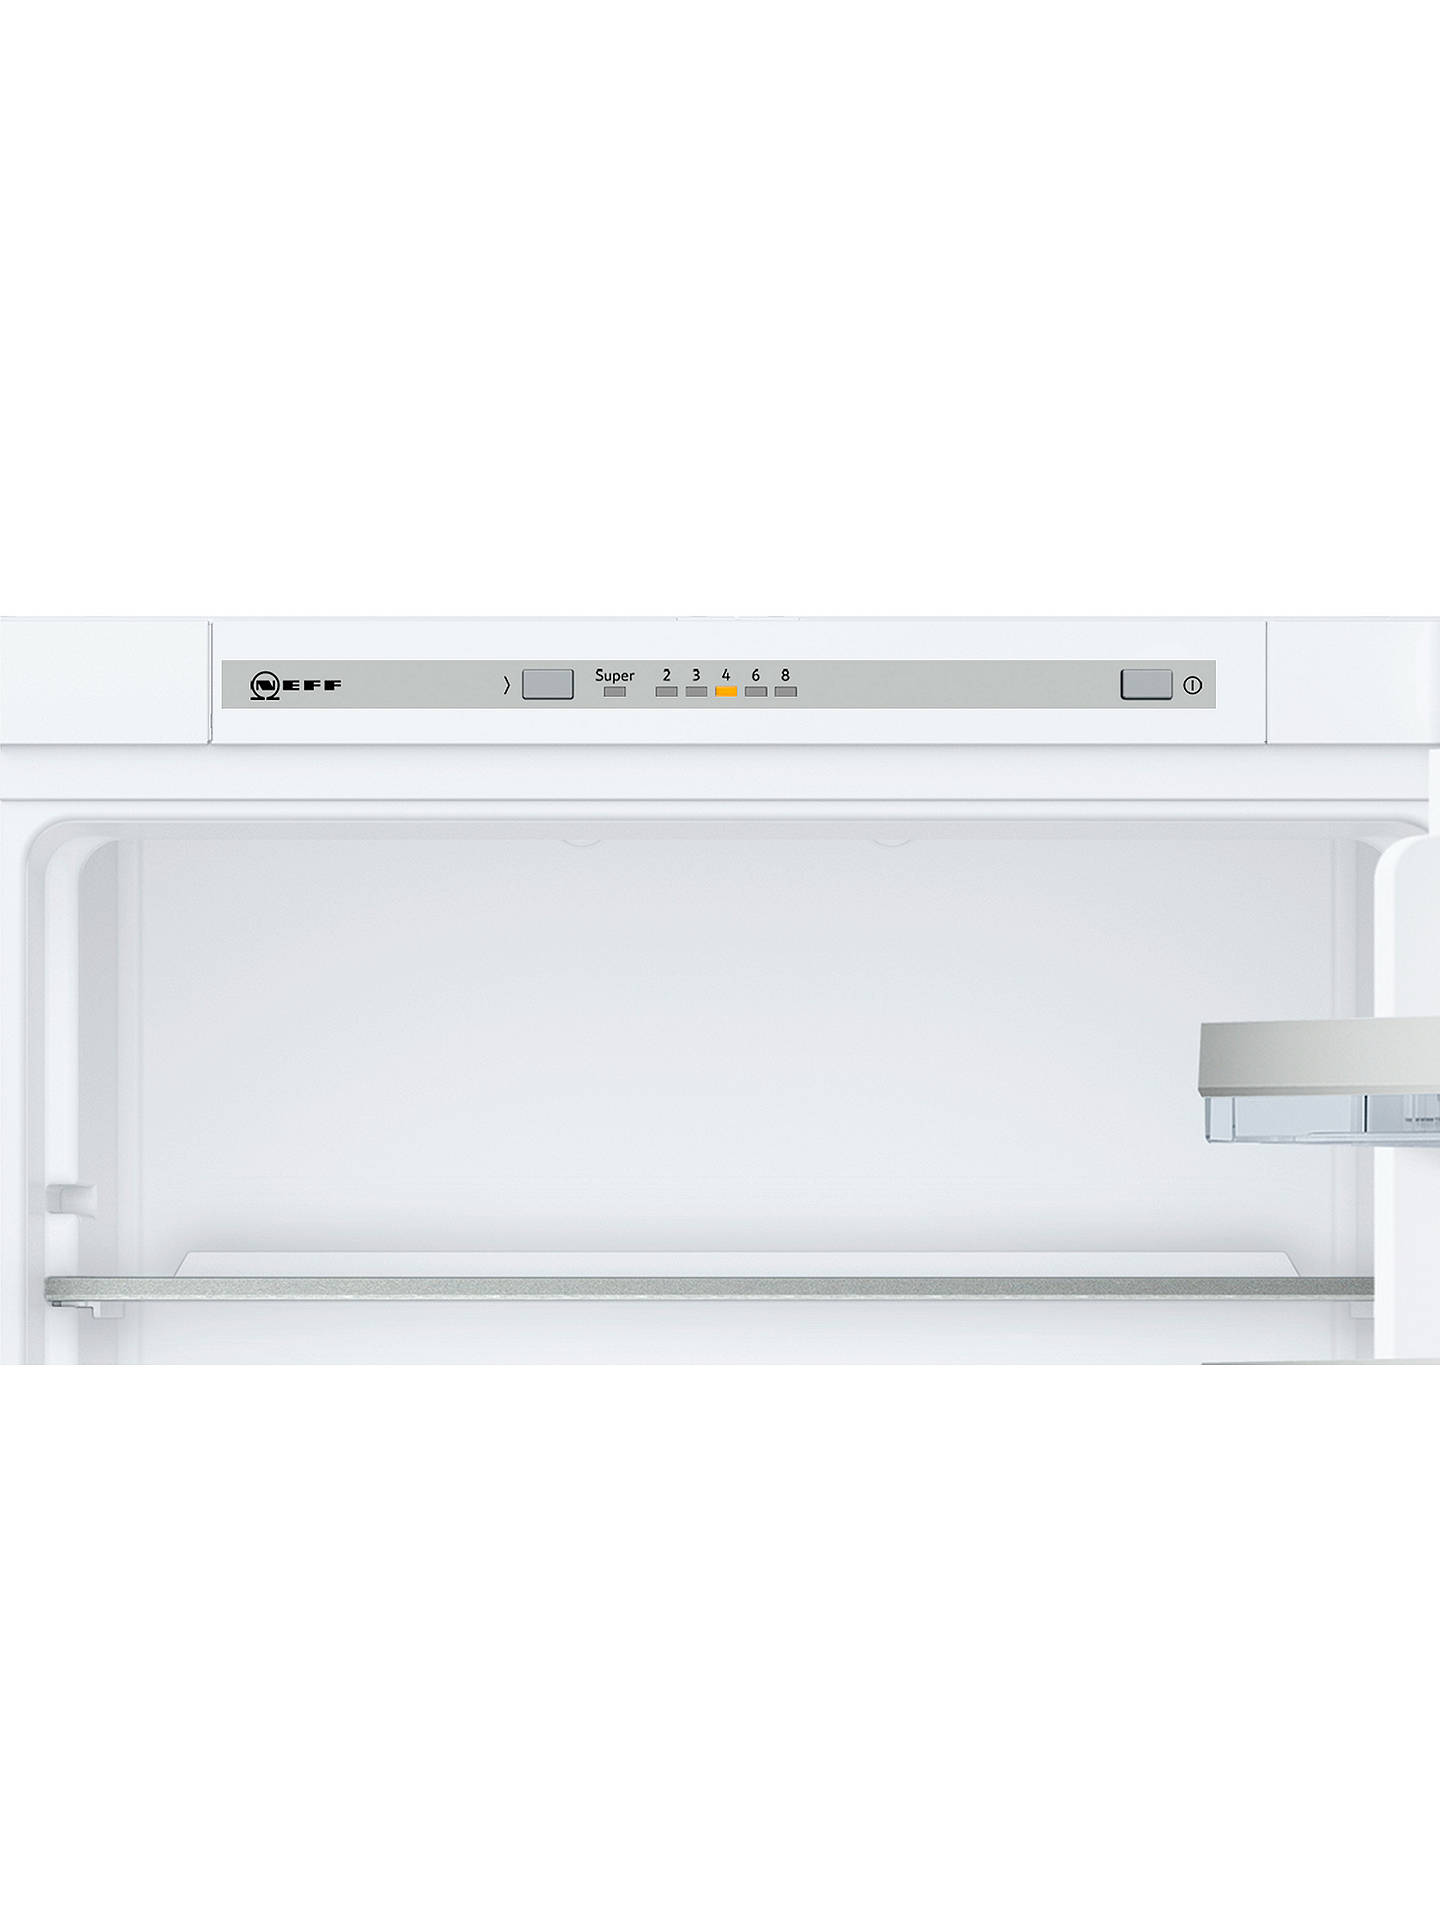 603c4aba881 ... Buy Neff KI5872S30G Integrated Fridge Freezer